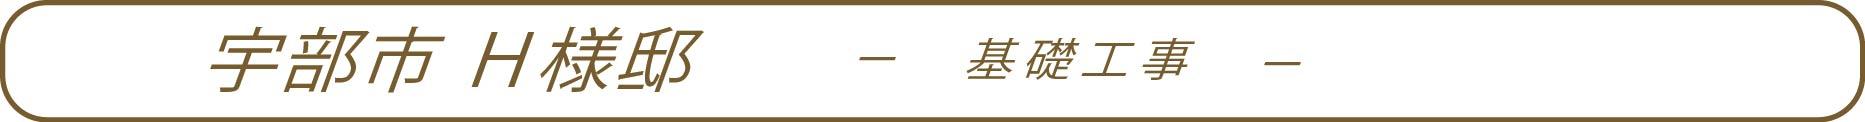 KuraSi-natu-sin83-08.jpg